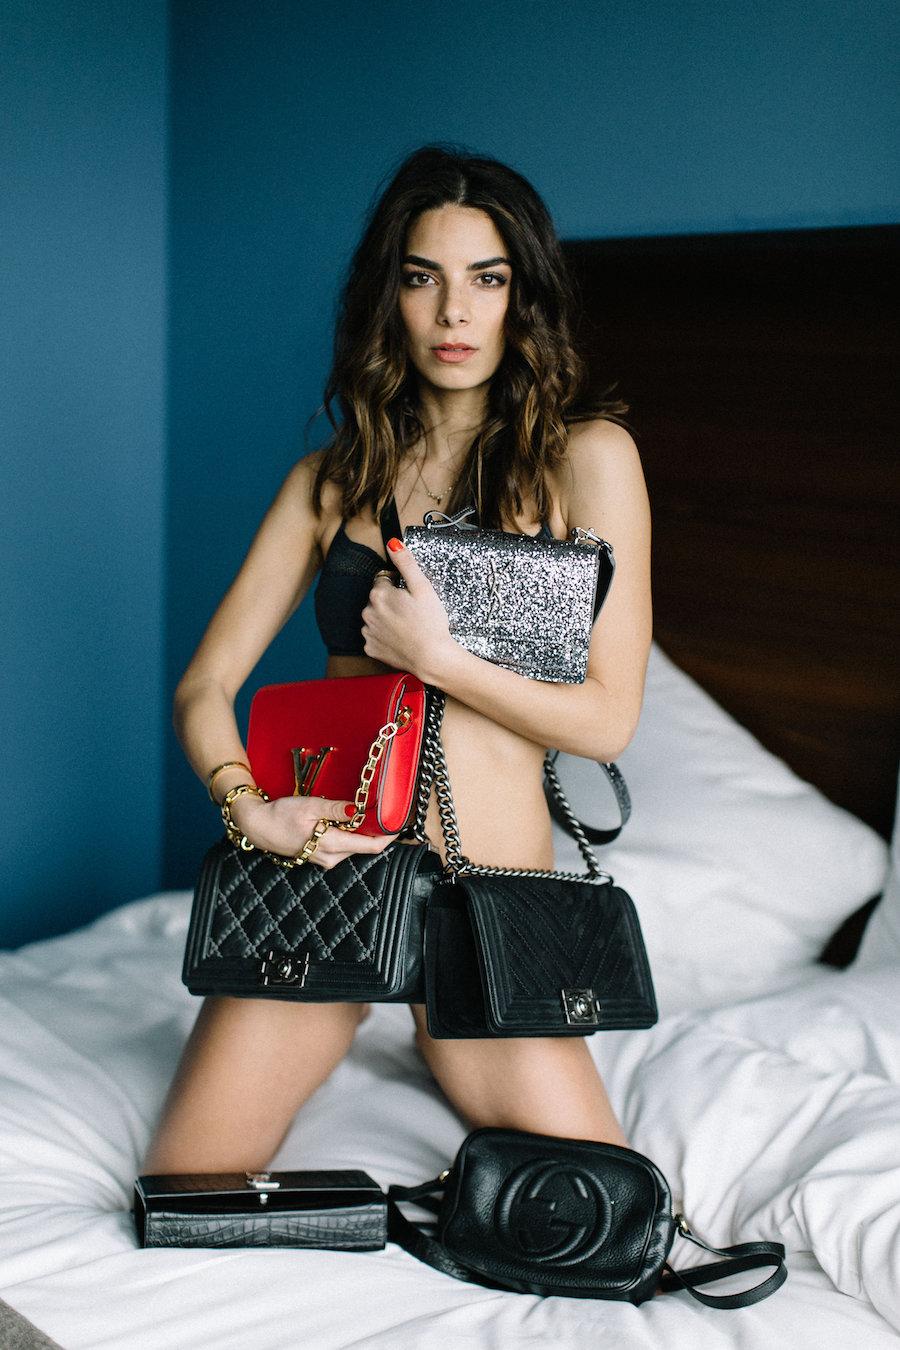 Chanel bags lilli Hollunder Instagram blogger